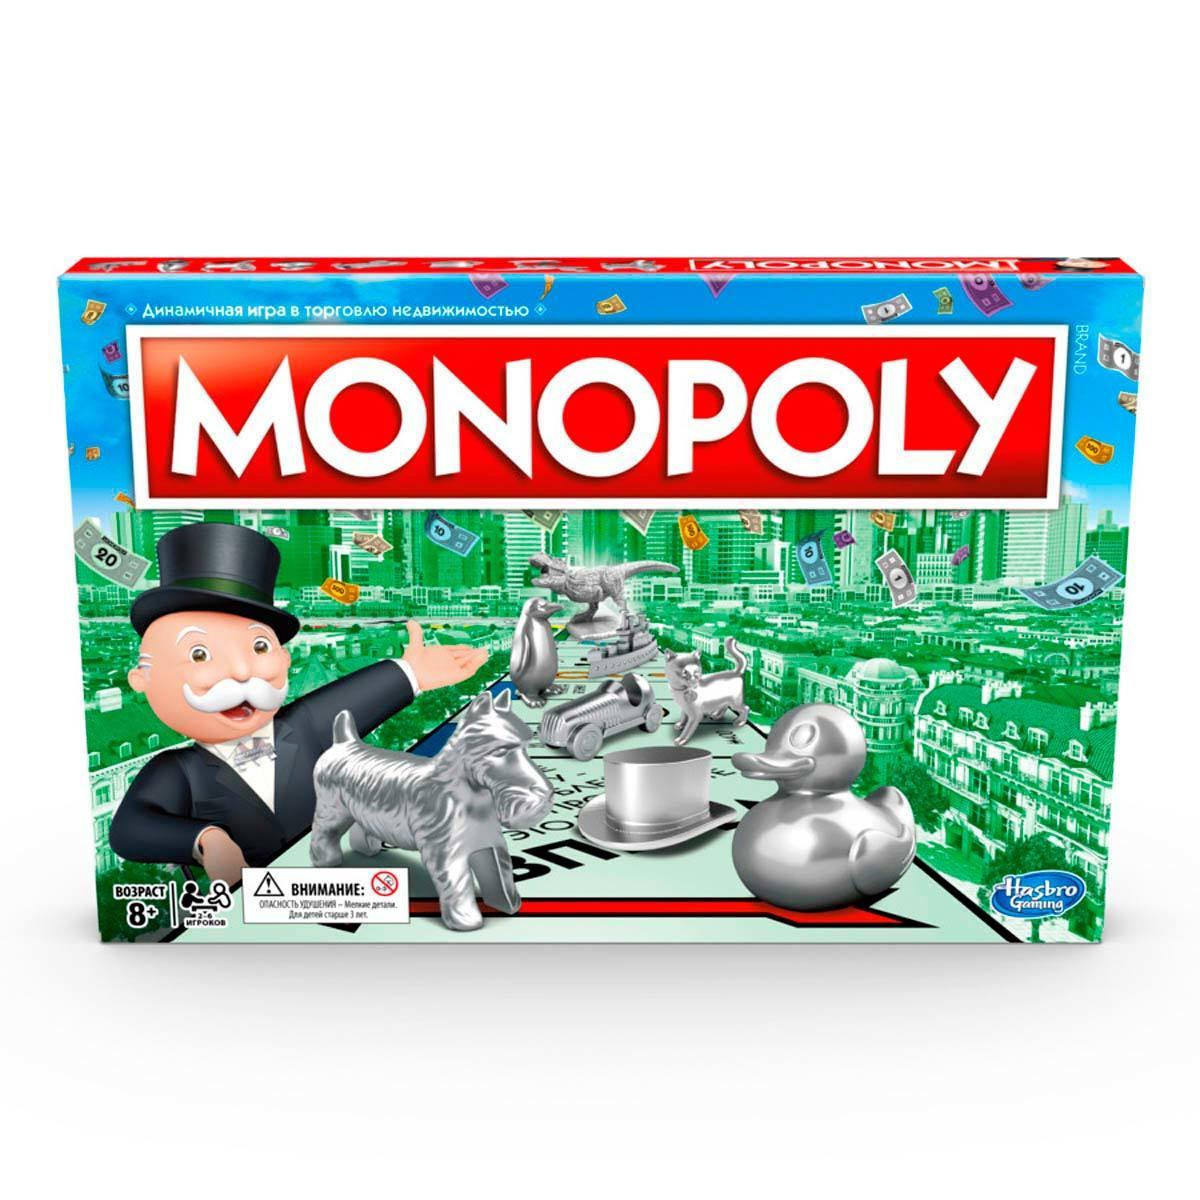 Monopoly clásico chedraui